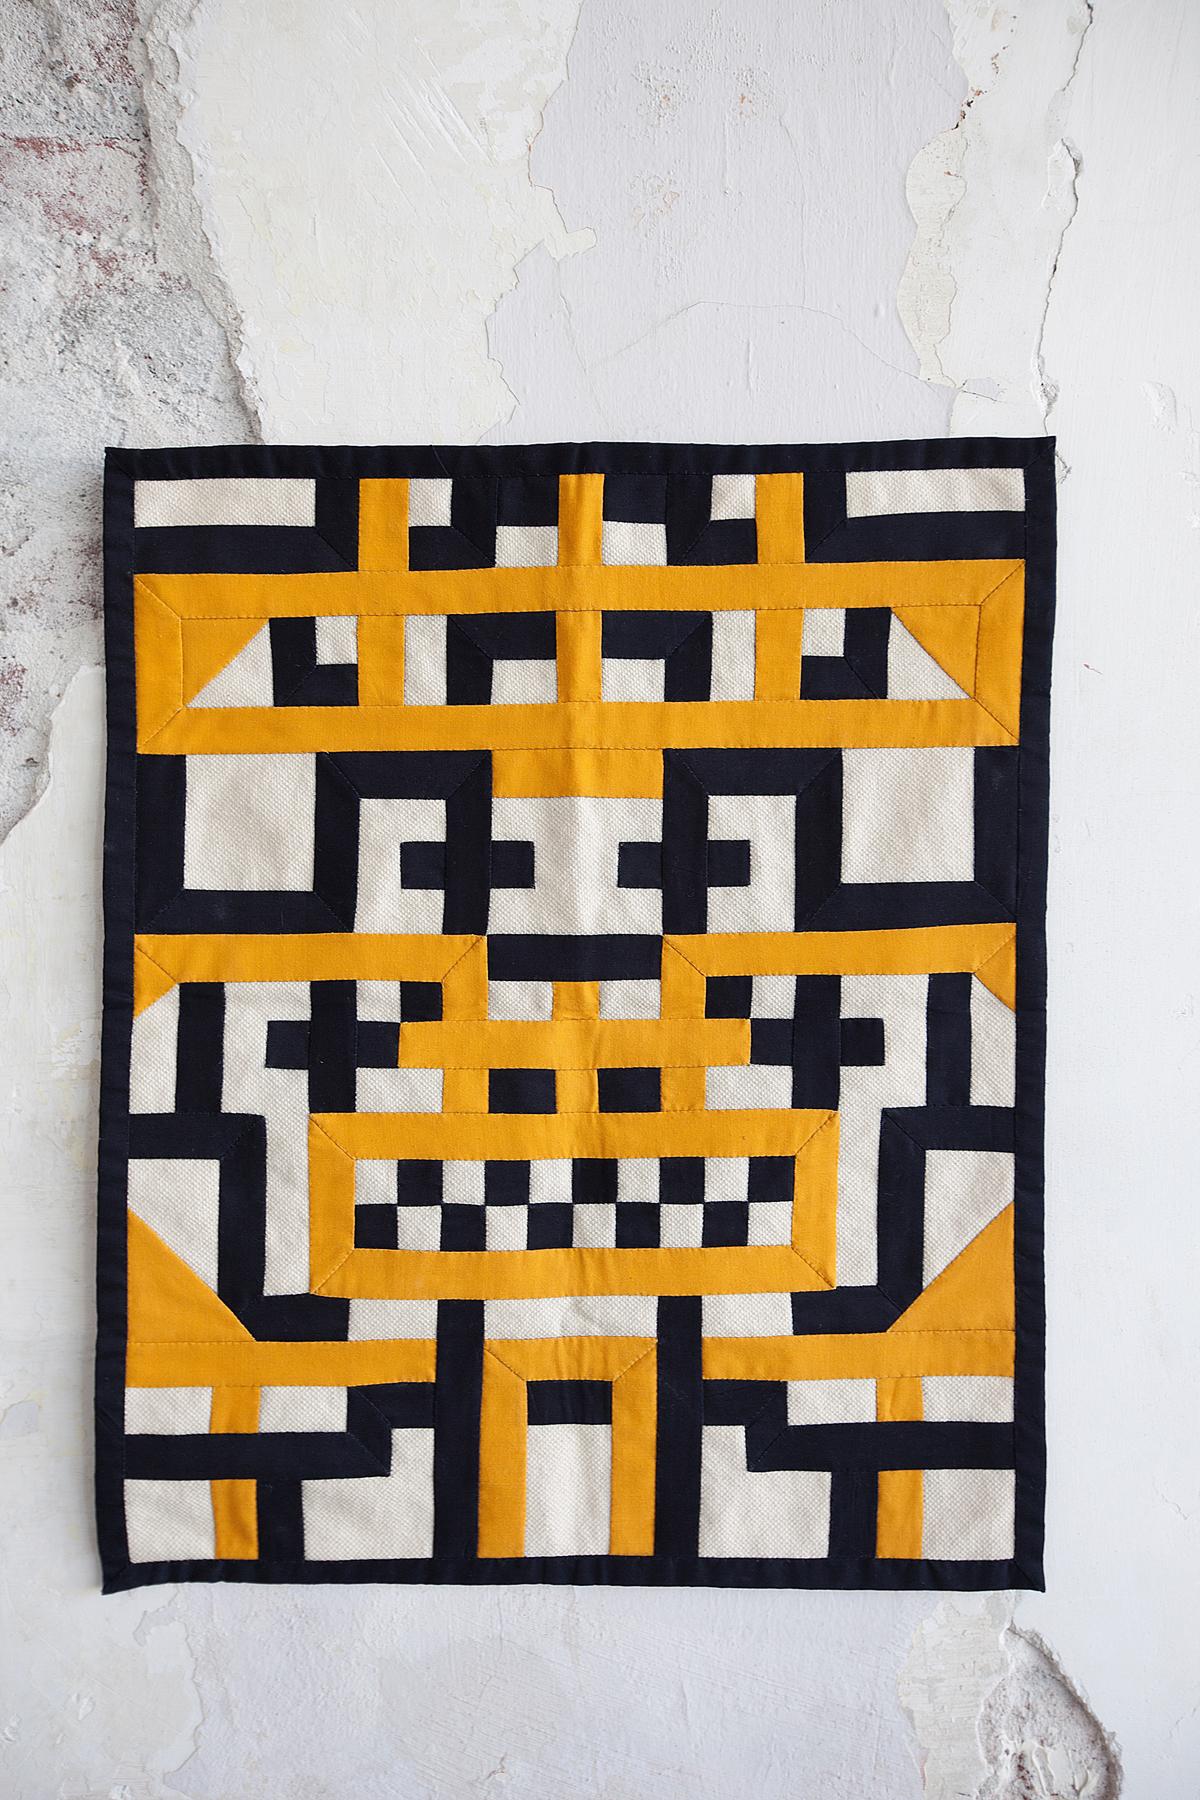 Kheyameya wall hanging by Damien Poulain. Image: Renee Arns